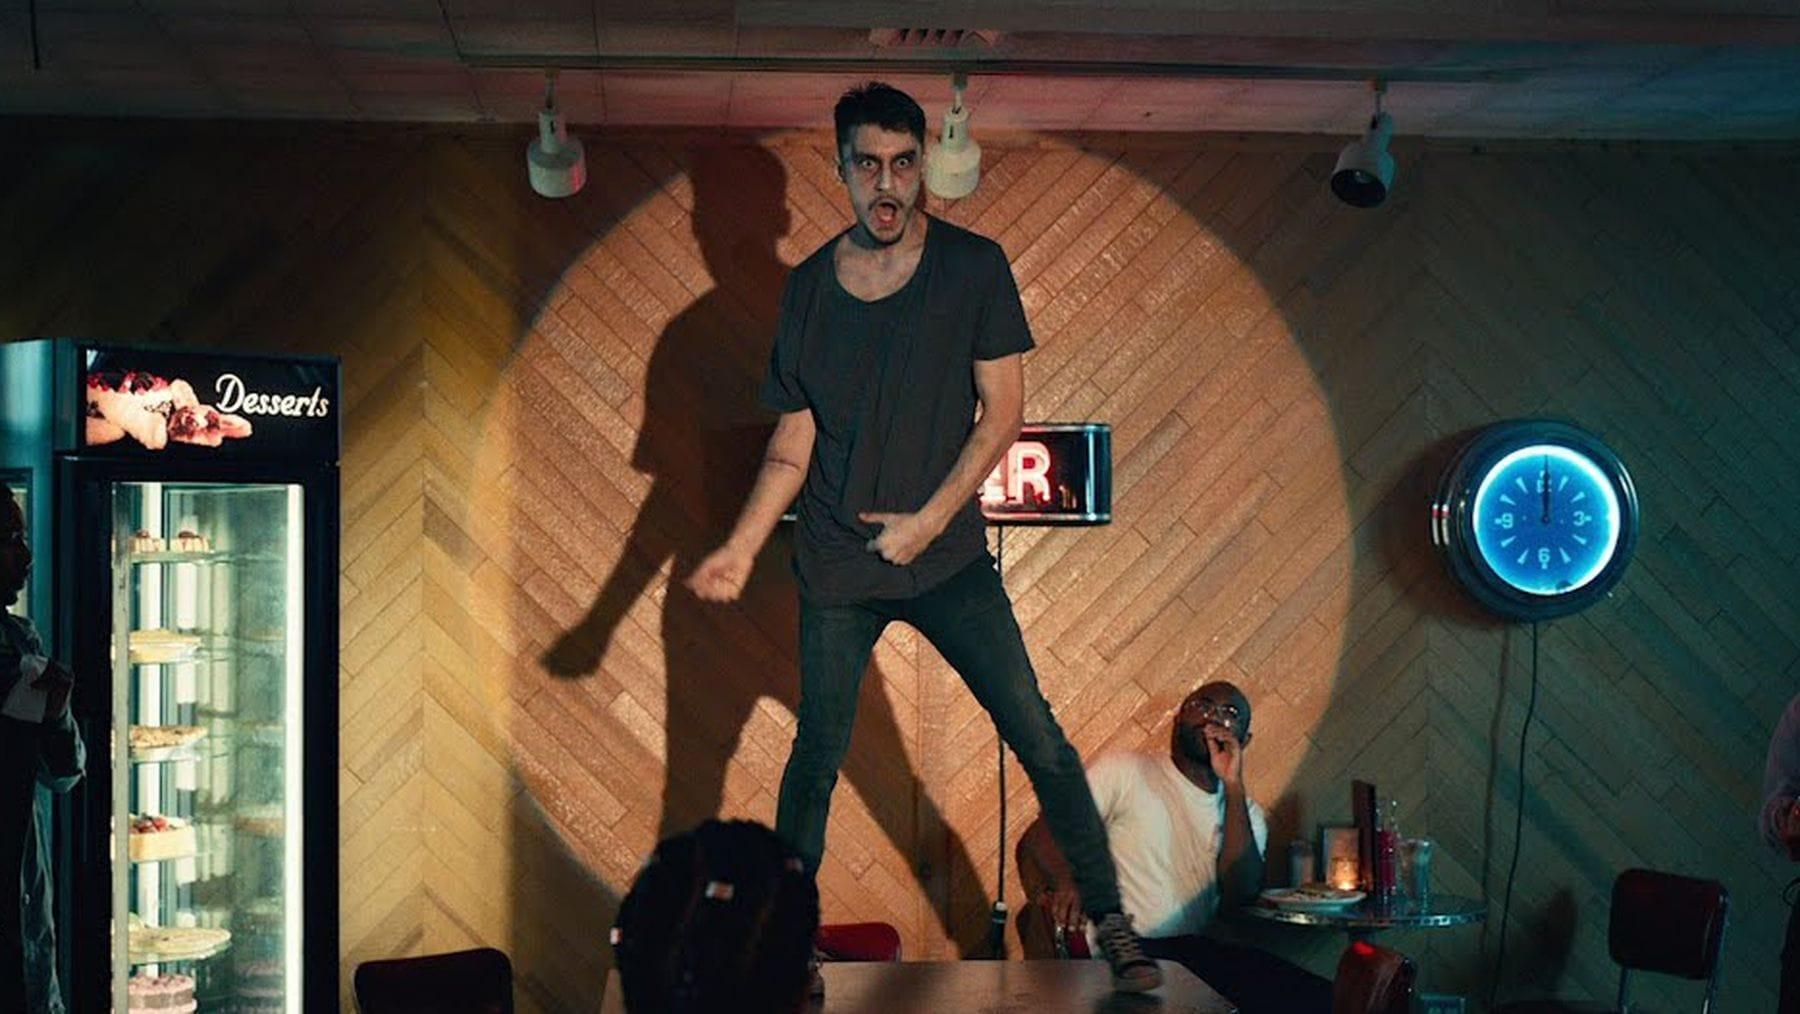 Tiësto - The Business | Musik | Was is hier eigentlich los?